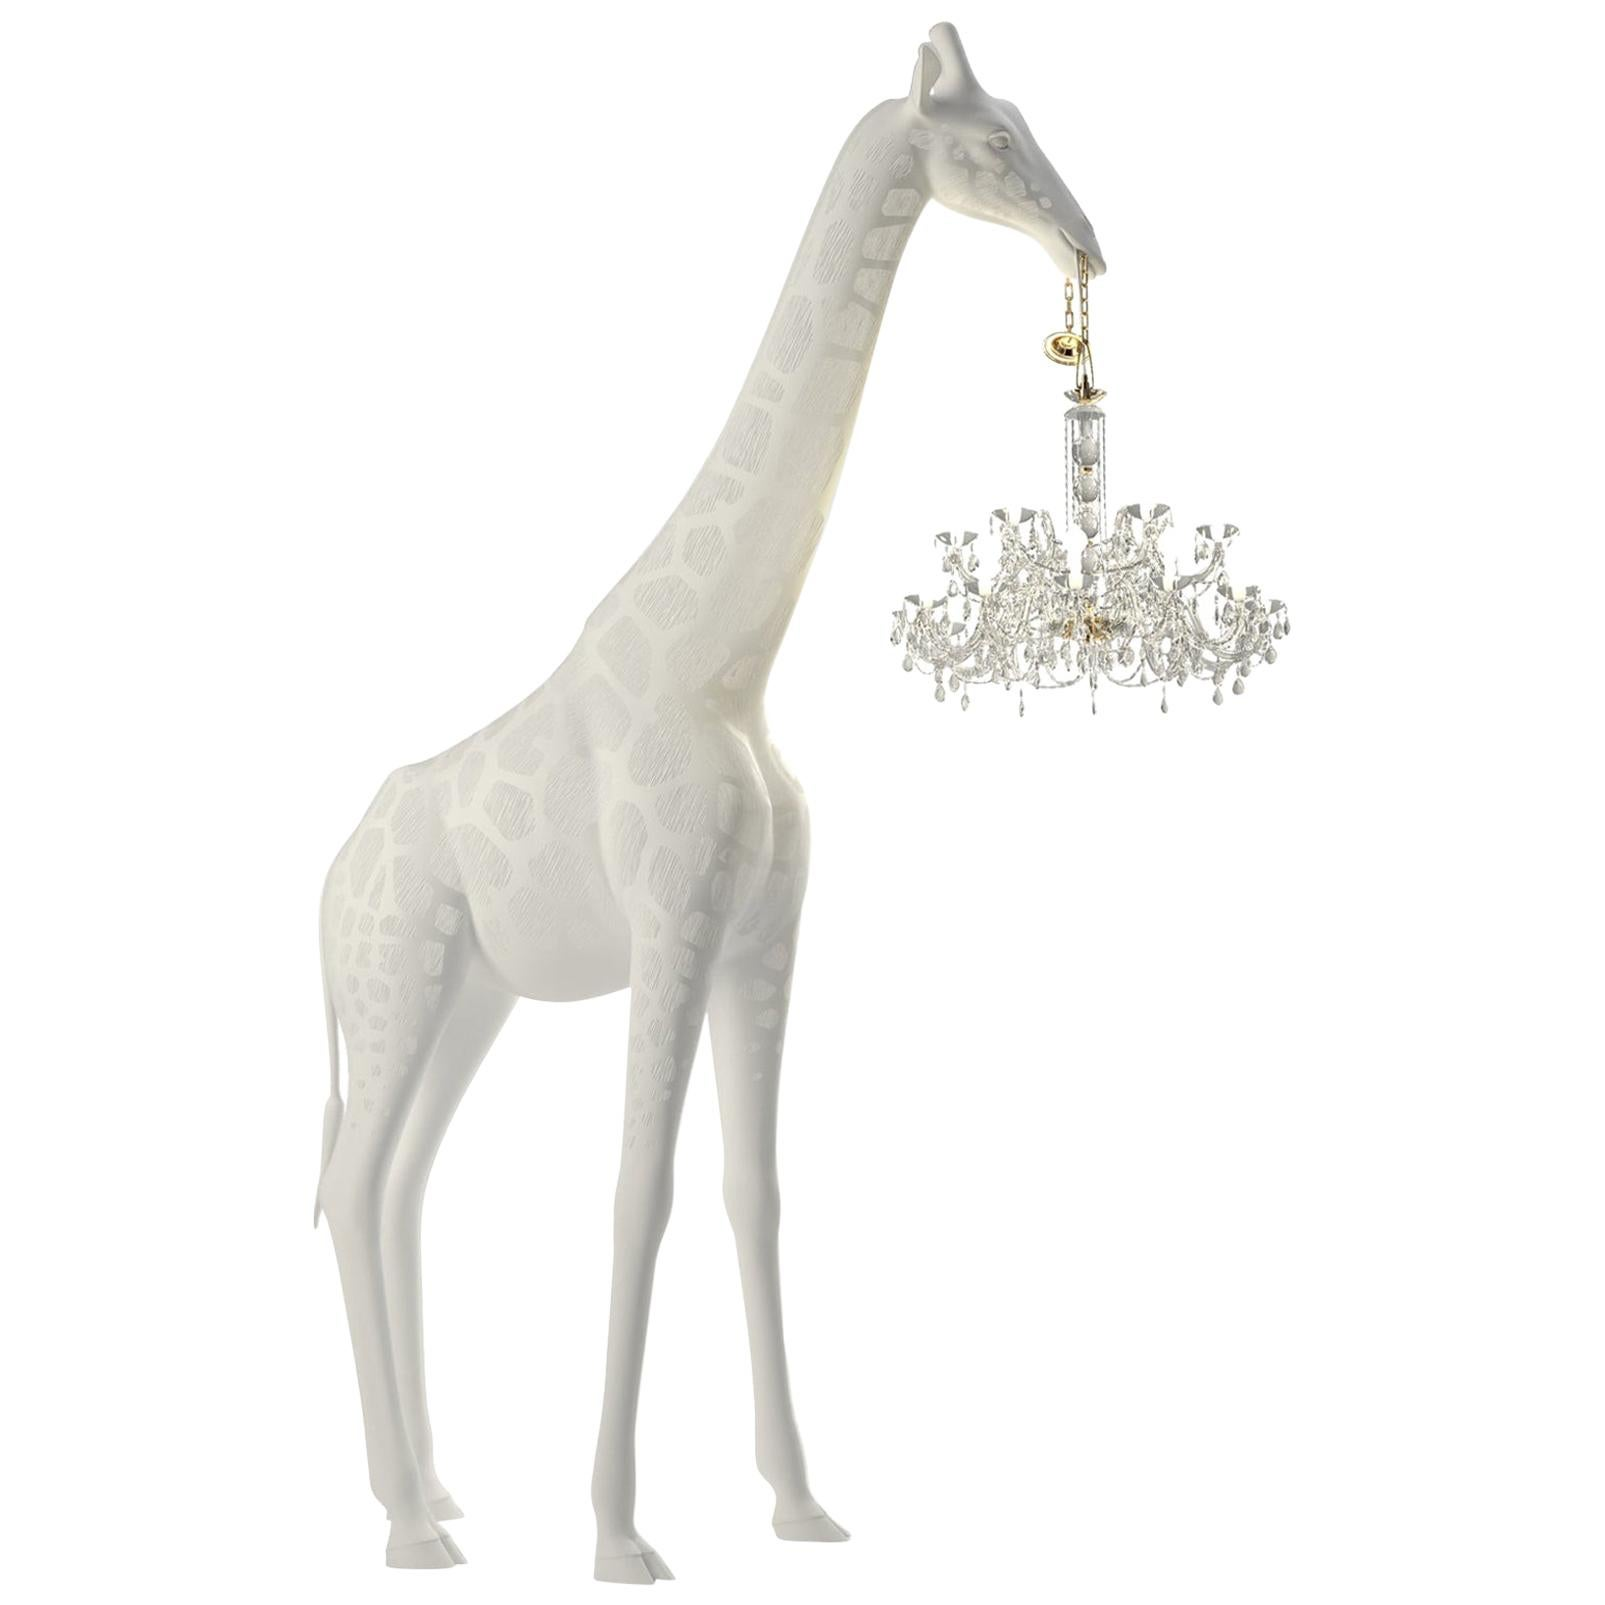 In Stock in Los Angeles, 8.6 Feet Pop Art White Indoor Giraffe with Chandelier